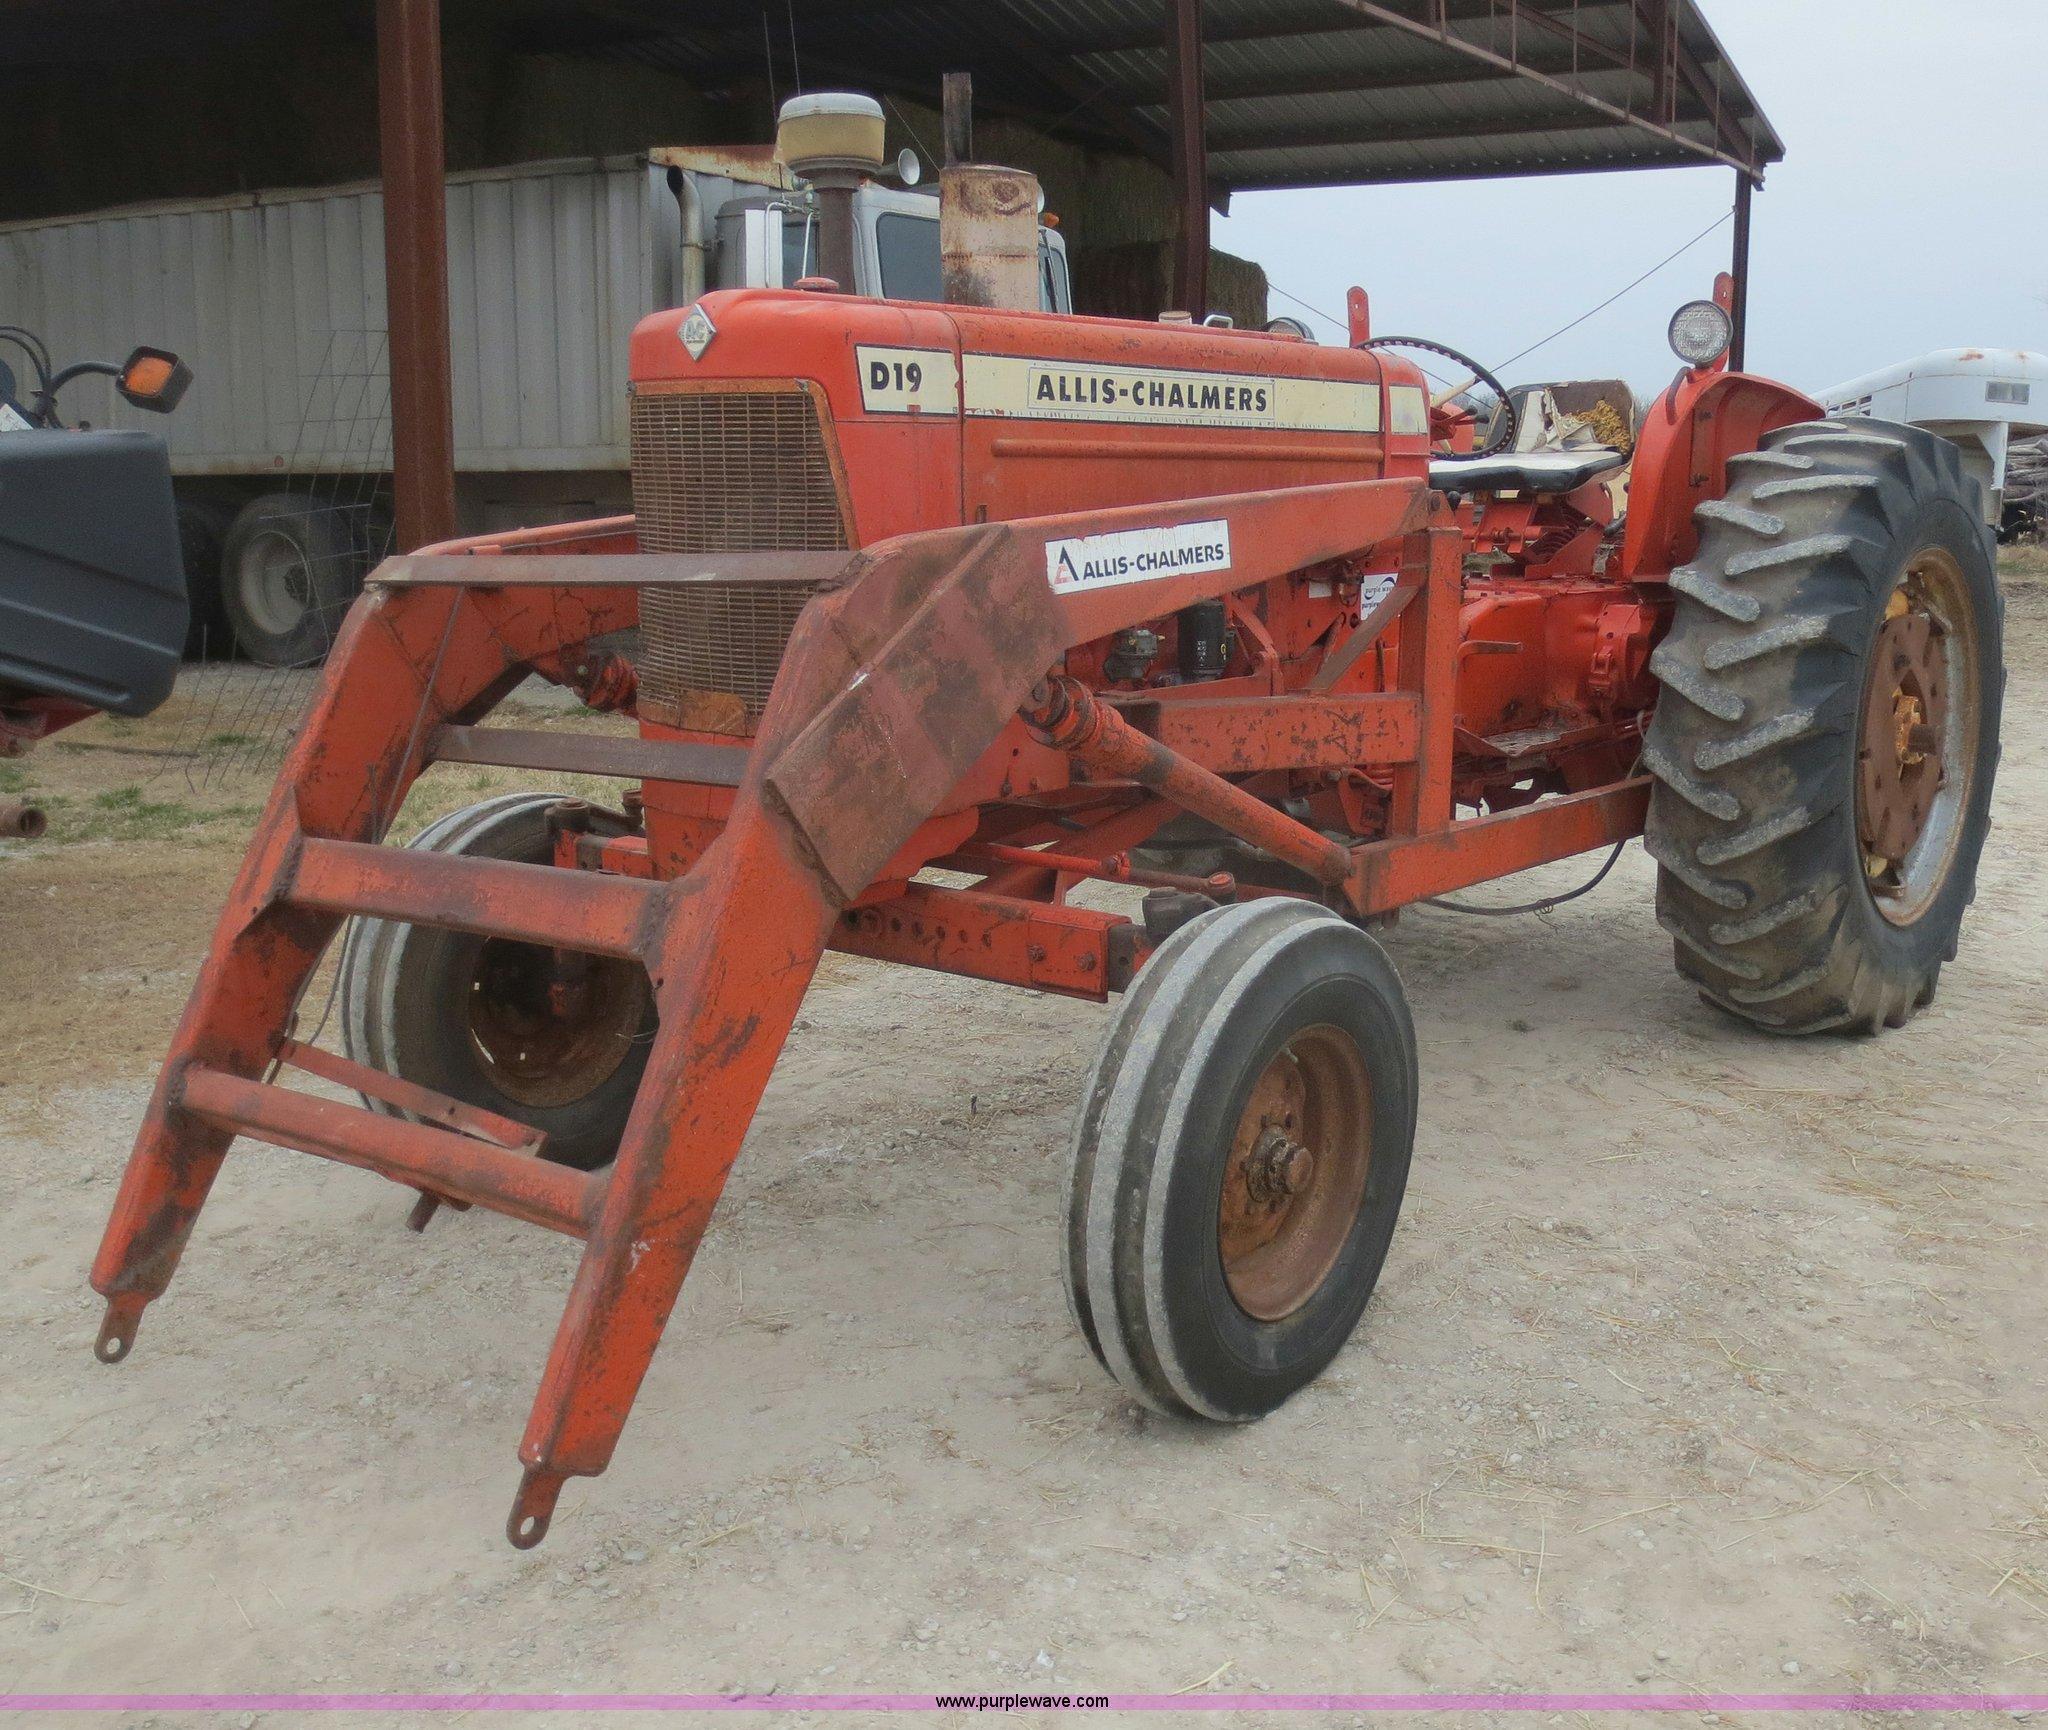 1964 Allis Chalmers D19 tractor   Item F8214   SOLD! April 2